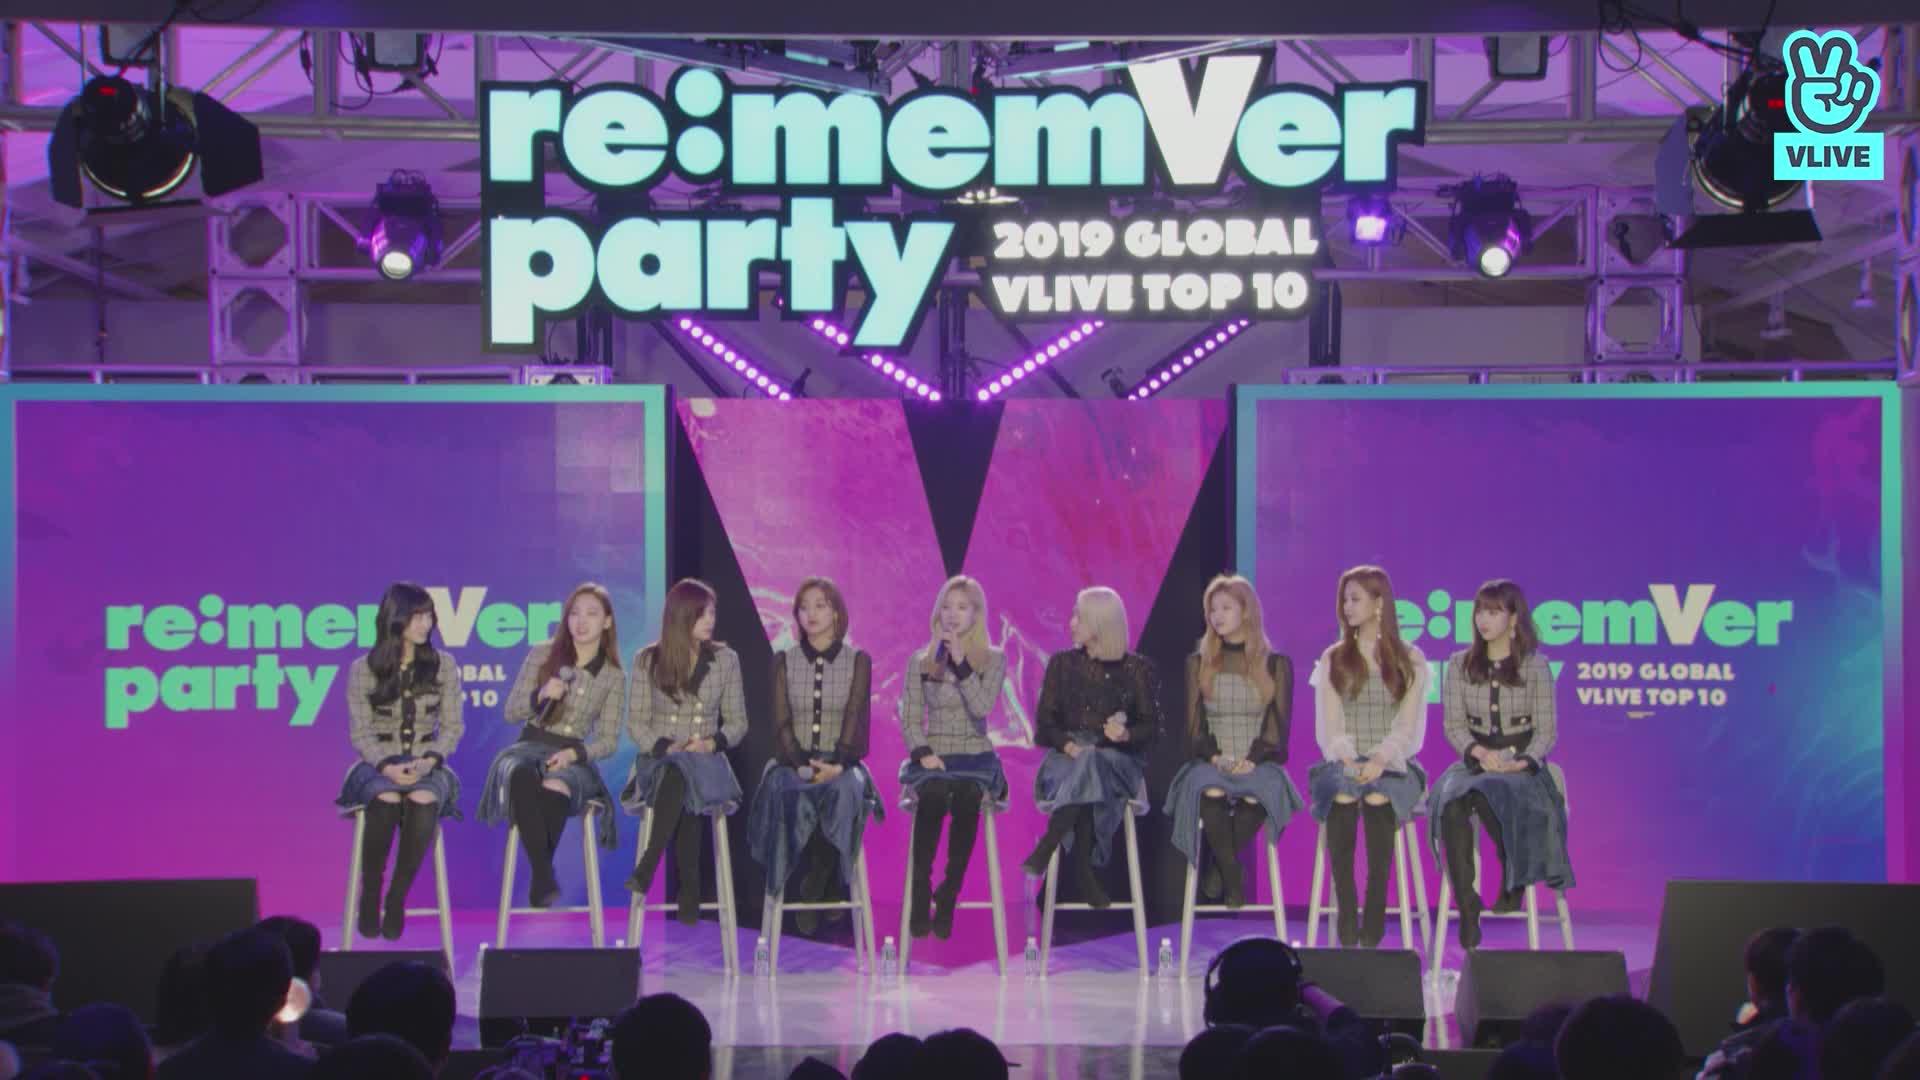 TWICE 리멤버파티 시상식 파트 1 / 2019 GLOBAL VLIVE TOP 10